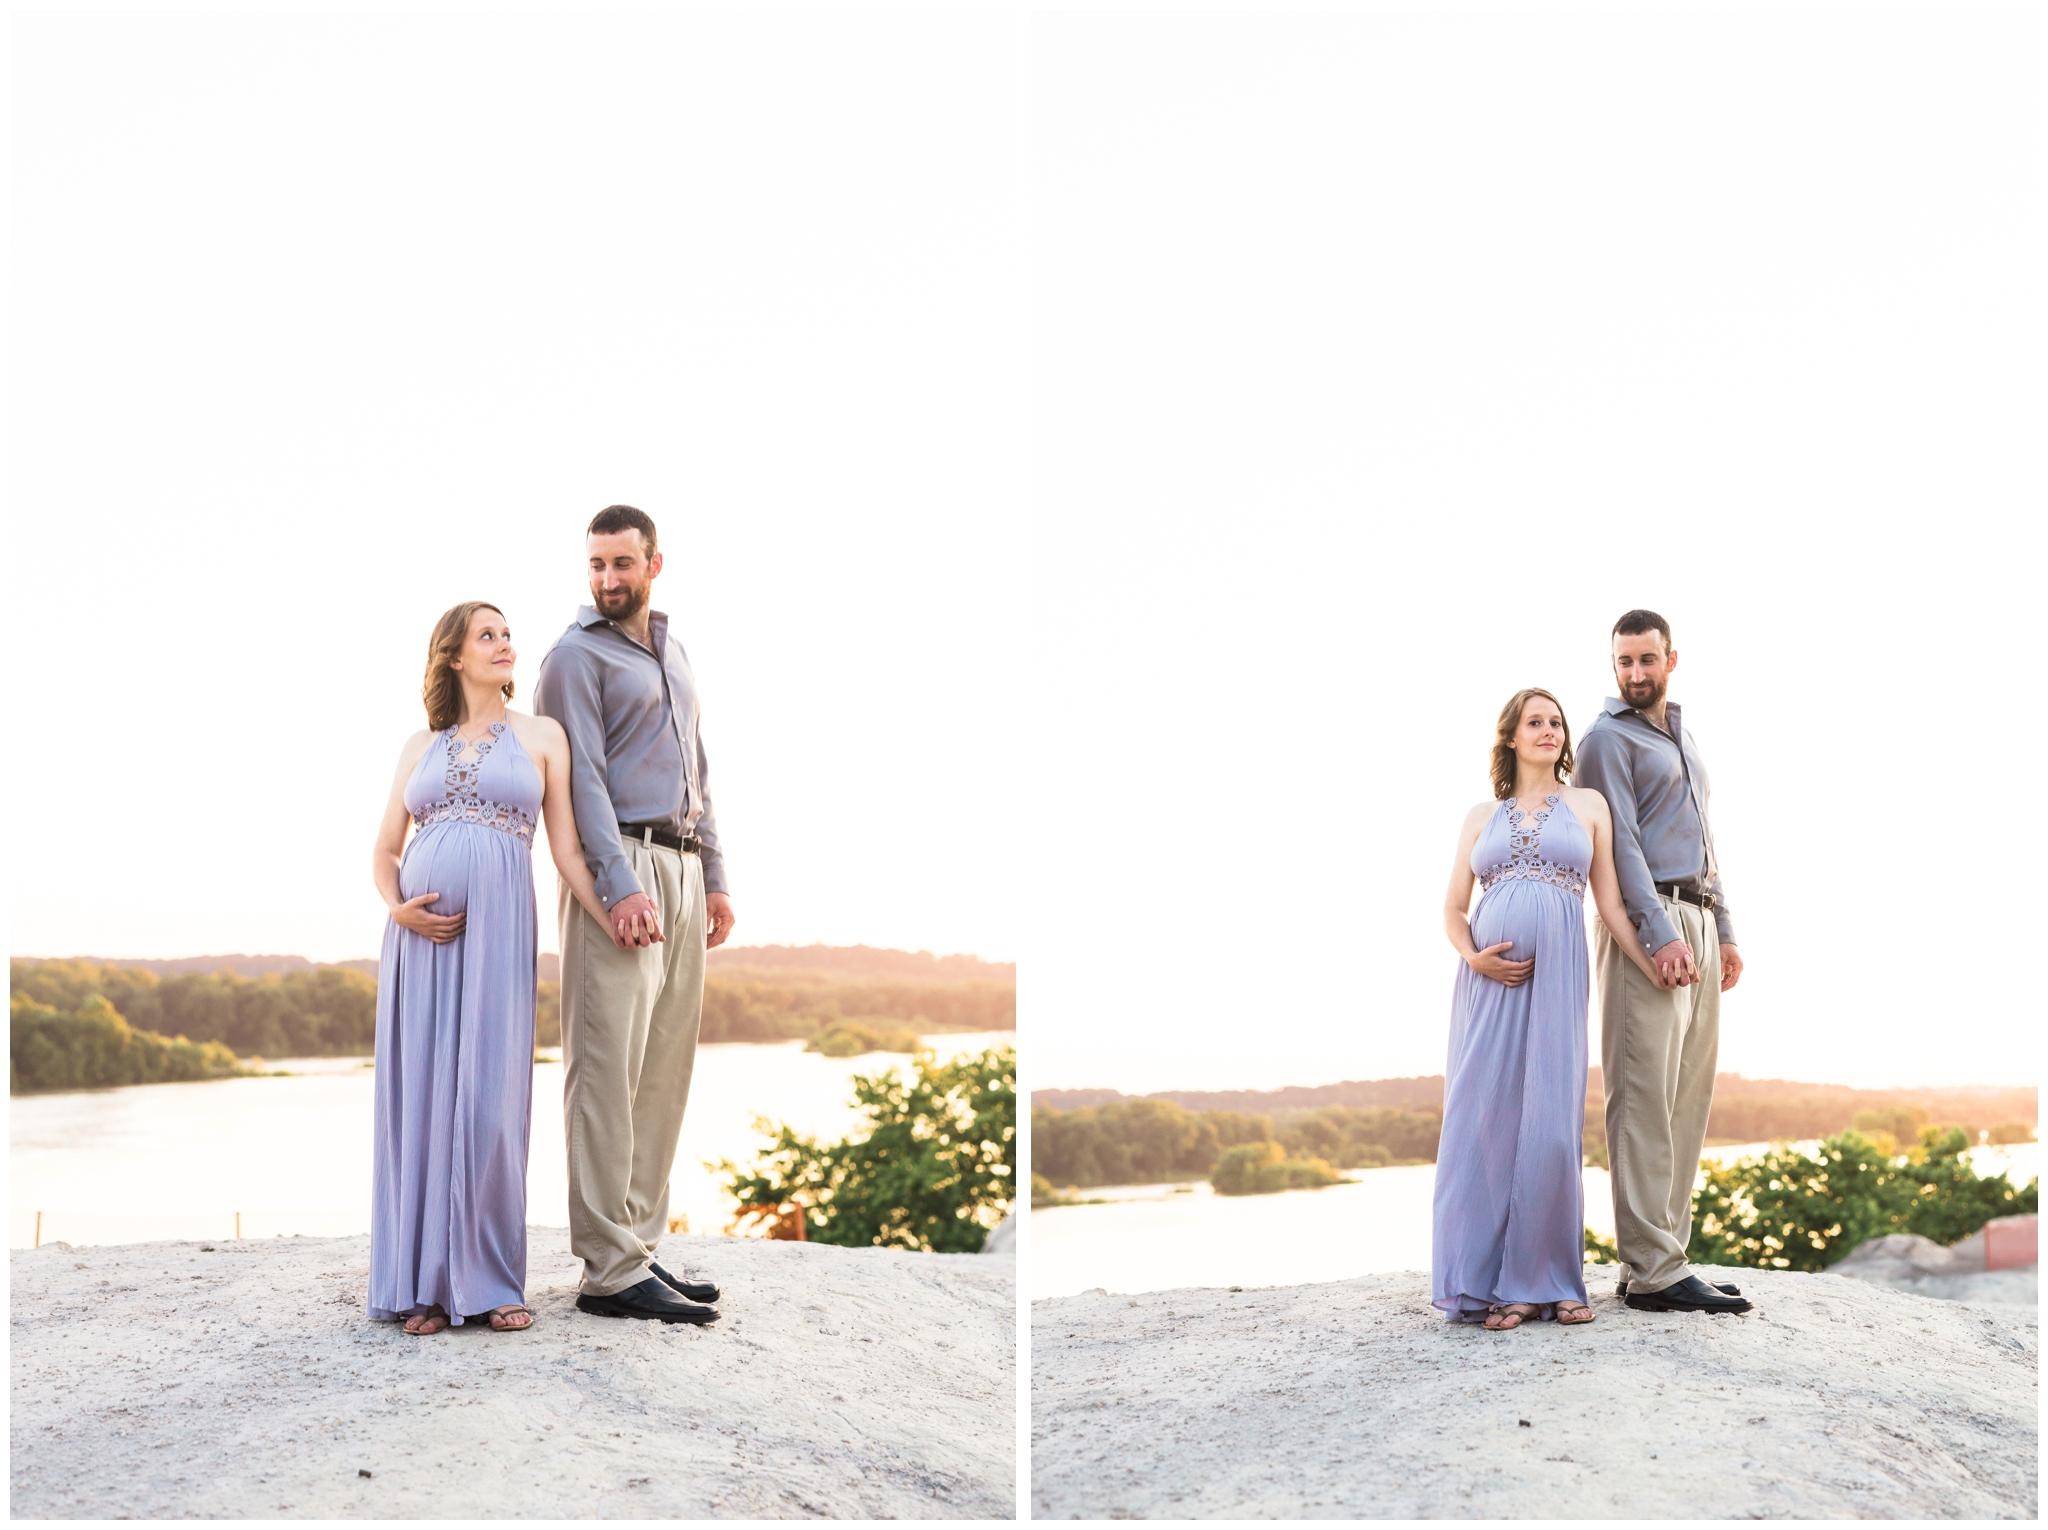 emily grace photography lancaster pa maternity photographer